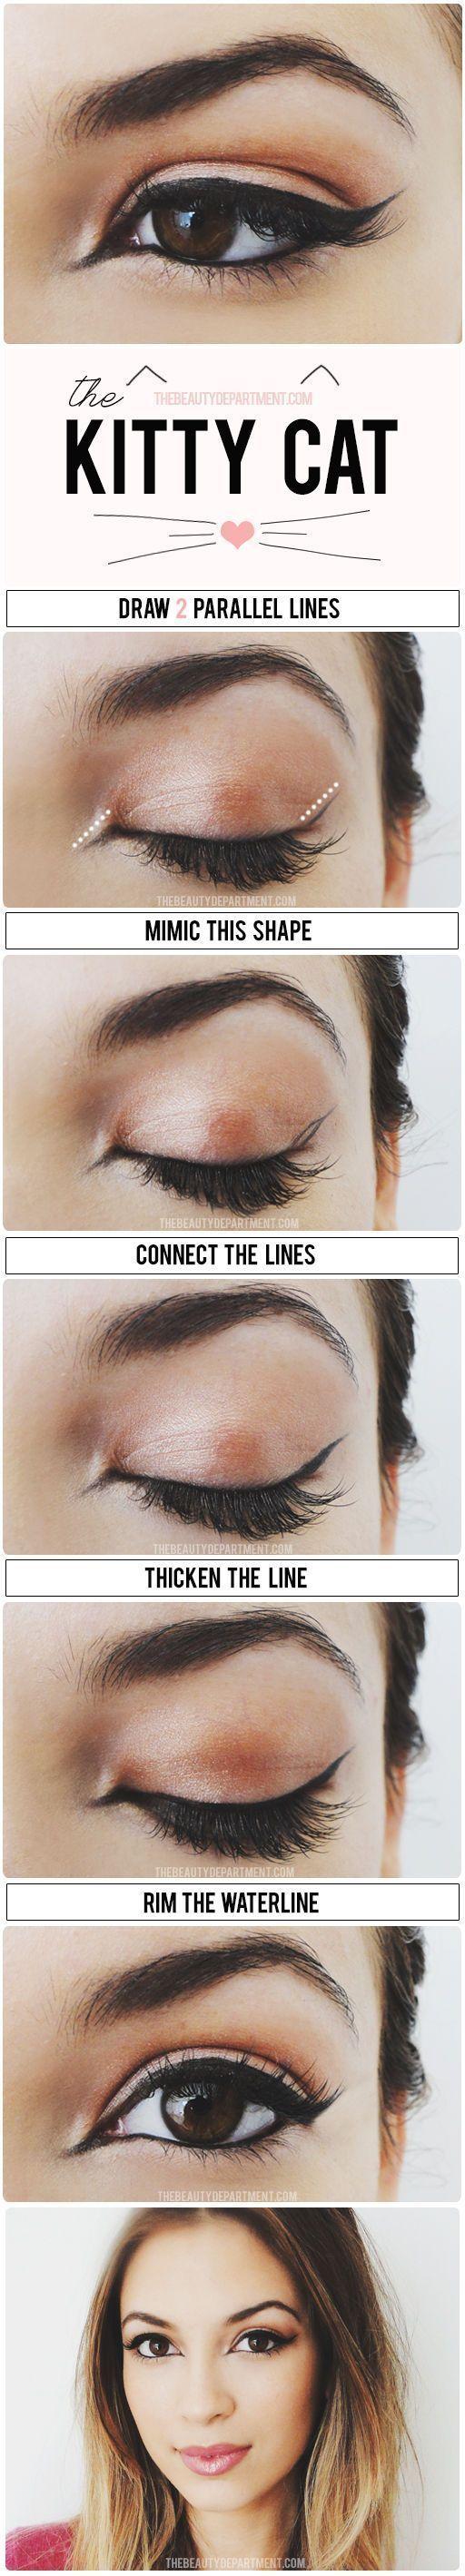 cat eye makeup tutorial - Cosmopolitan.co.uk (scheduled via http://www.tailwindapp.com?utm_source=pinterest&utm_medium=twpin&utm_content=post92486287&utm_campaign=scheduler_attribution)